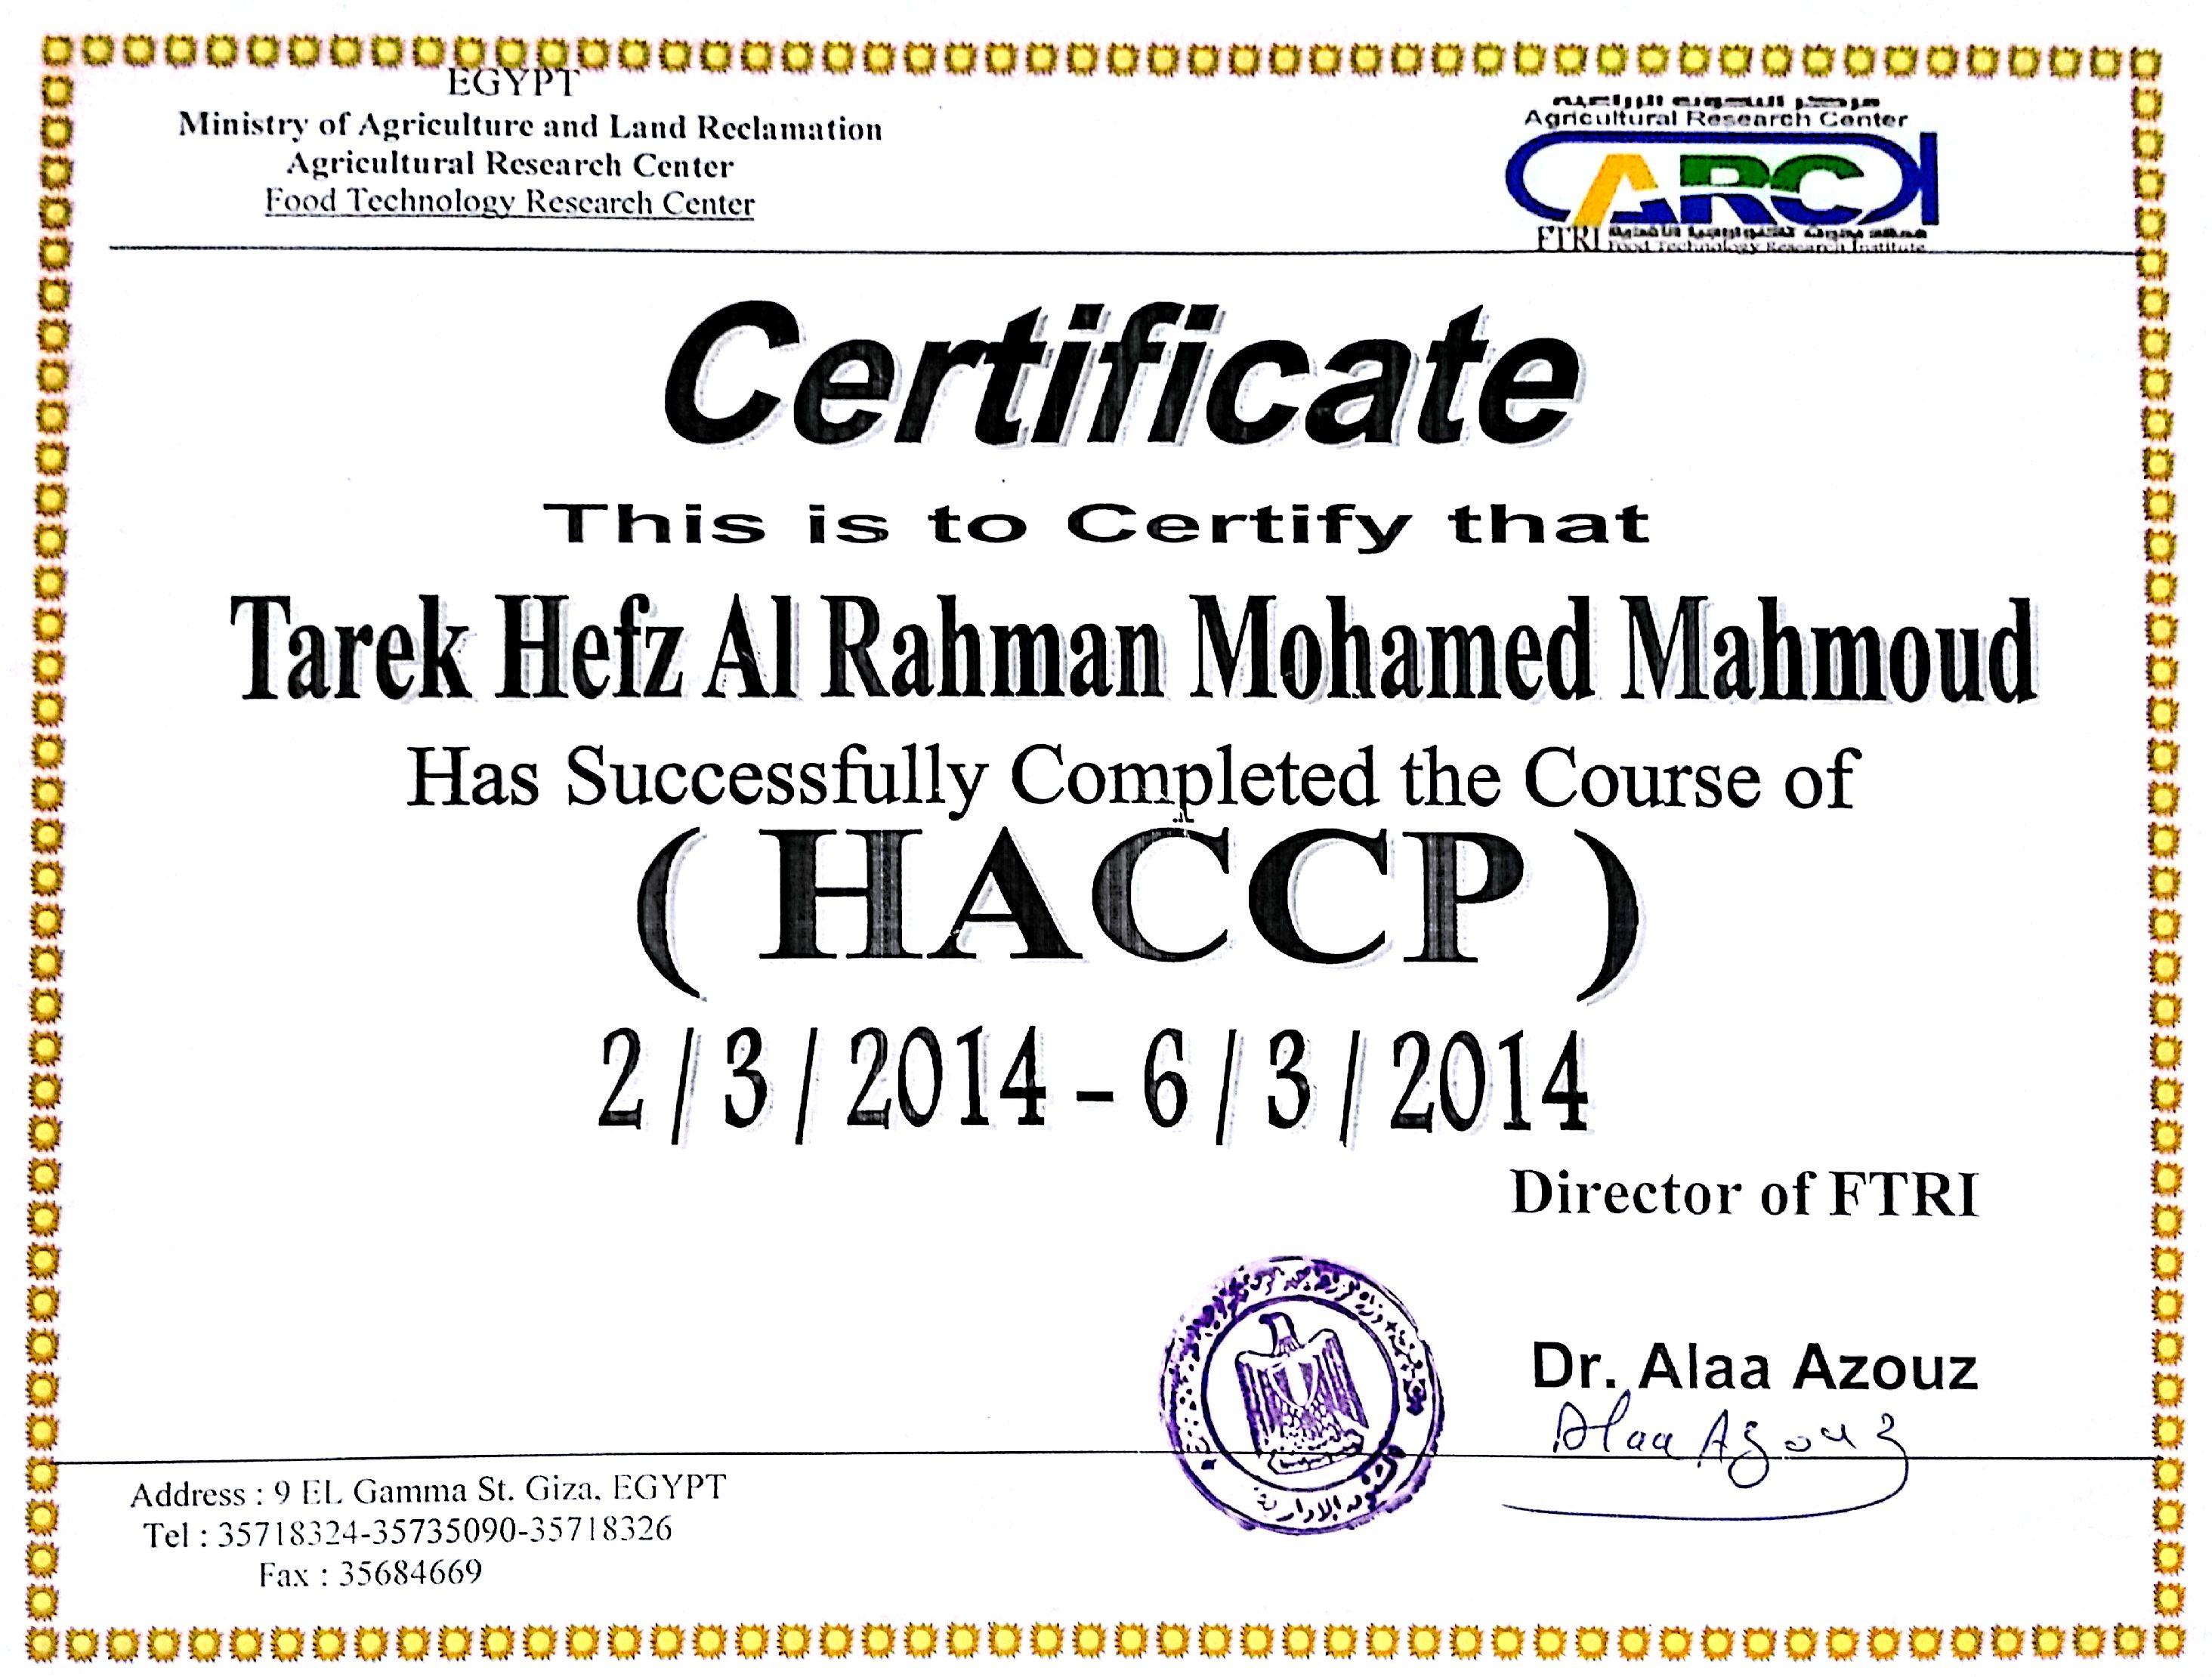 Tarek Hefz Alrahman Mohamed Mahmoud Bayt Com